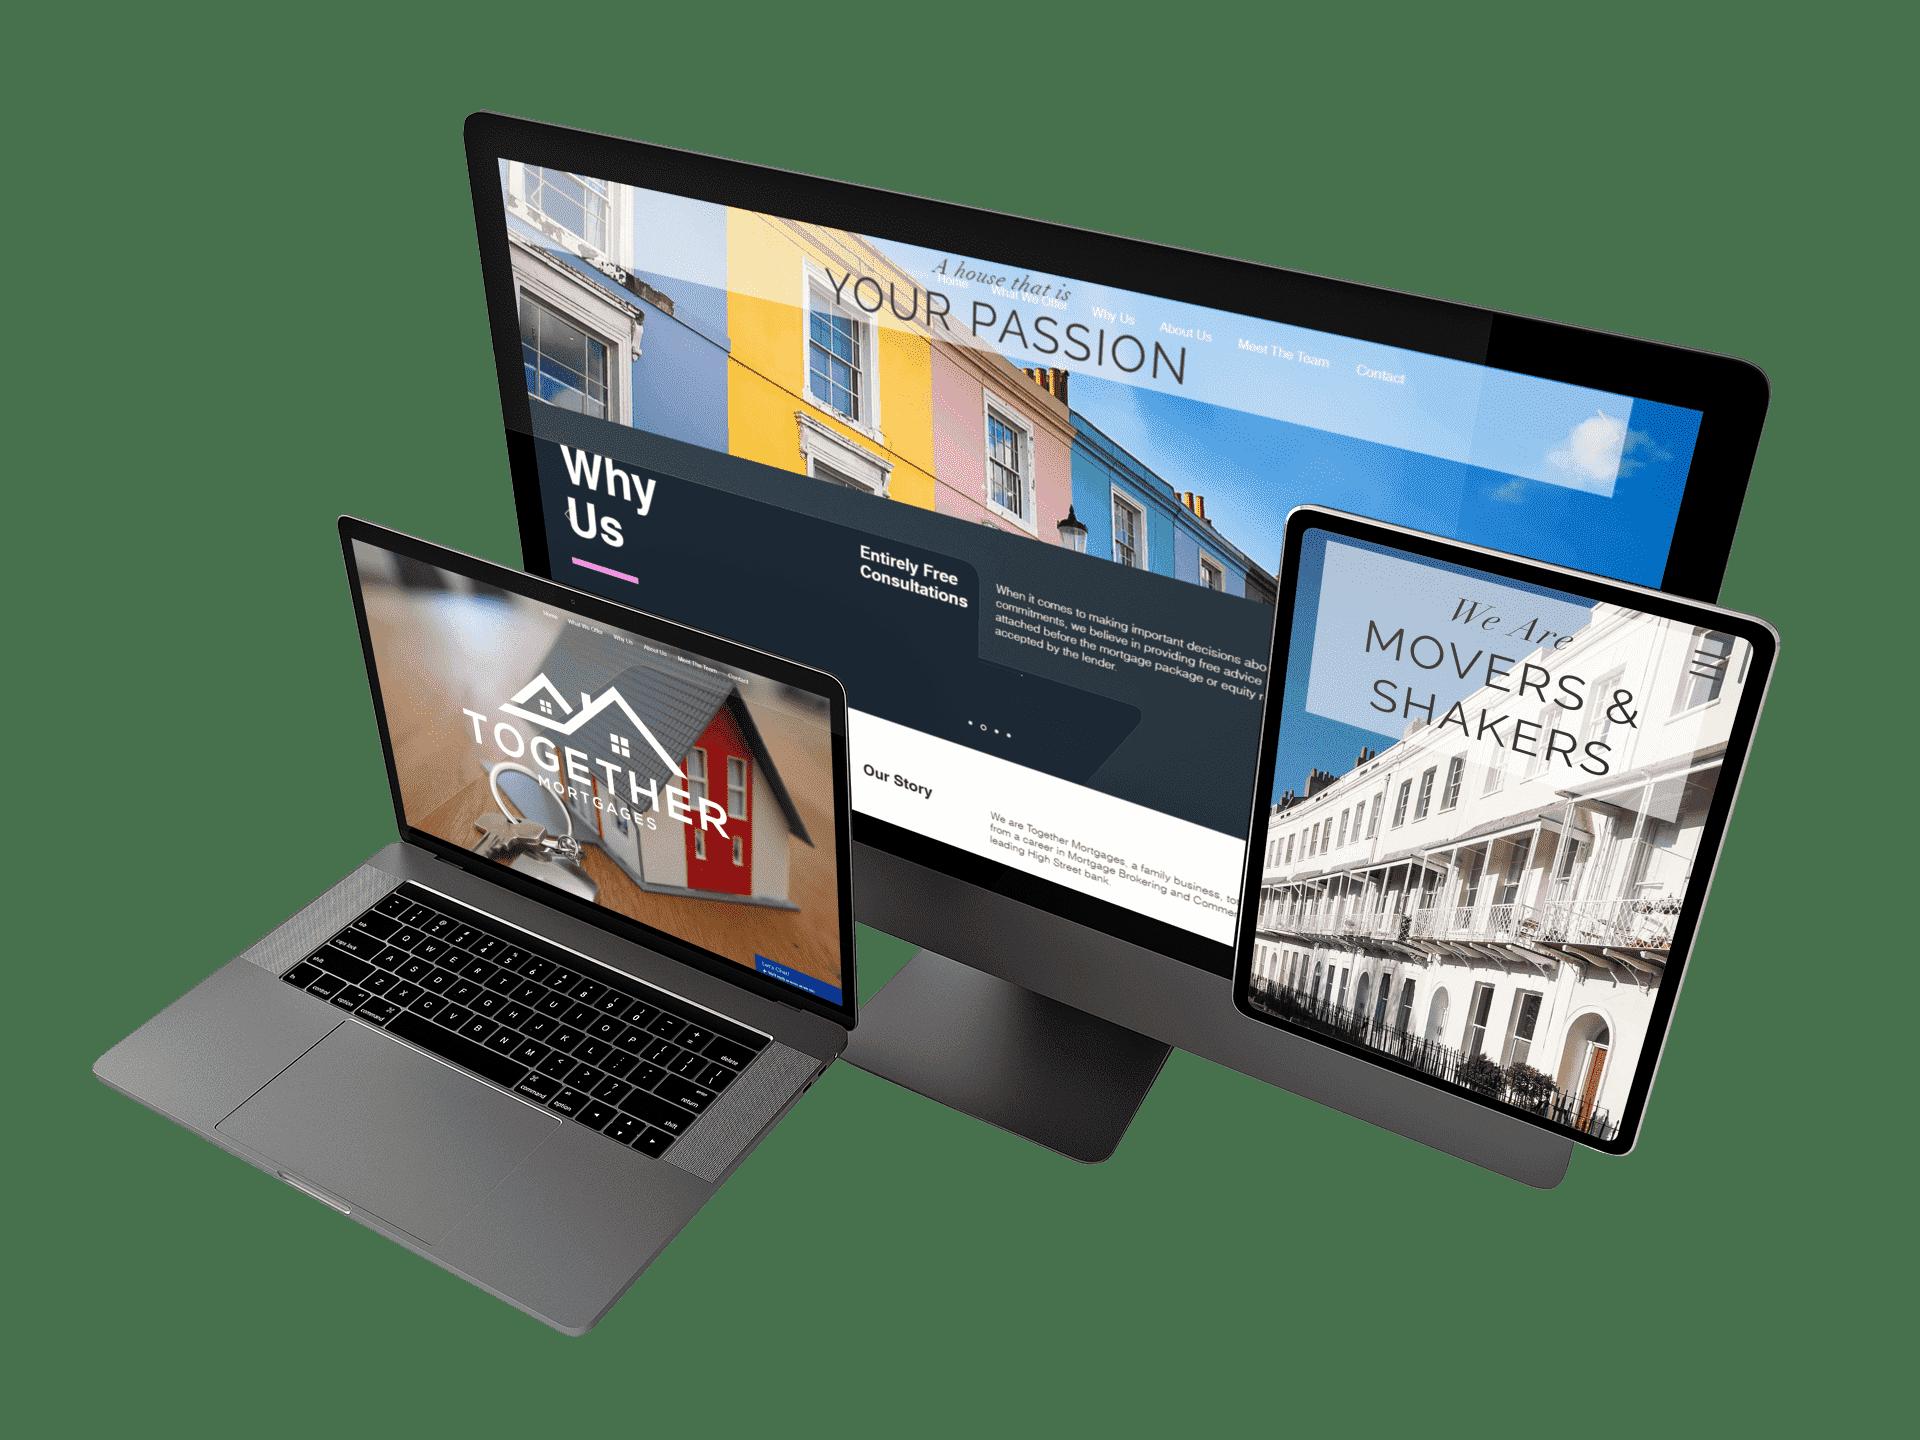 Mock-up of the Together Mortgages website